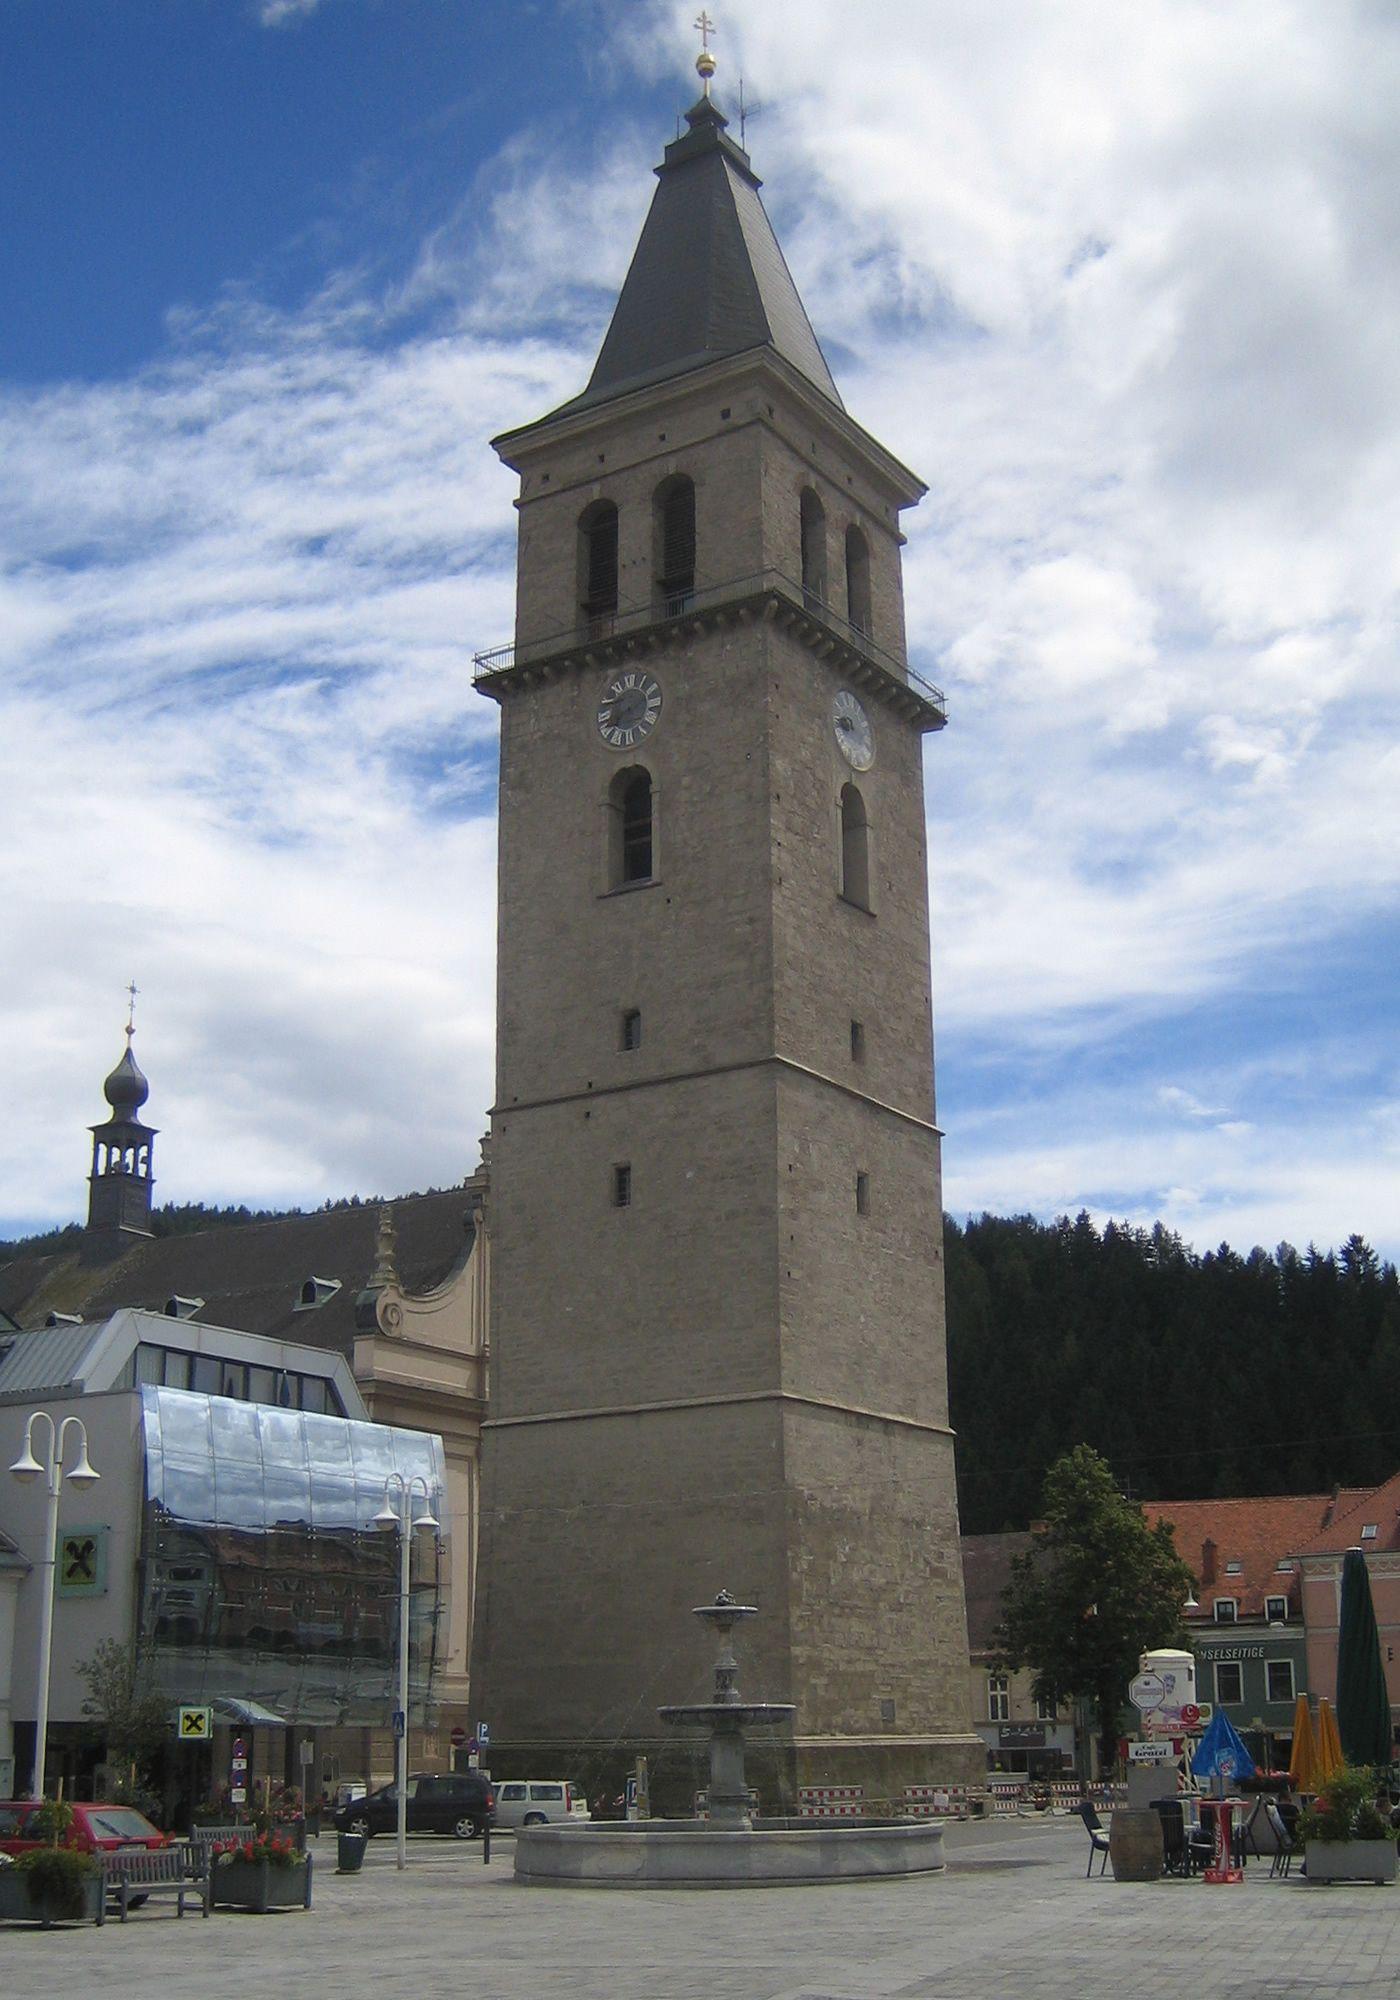 Judenburg stadtturm